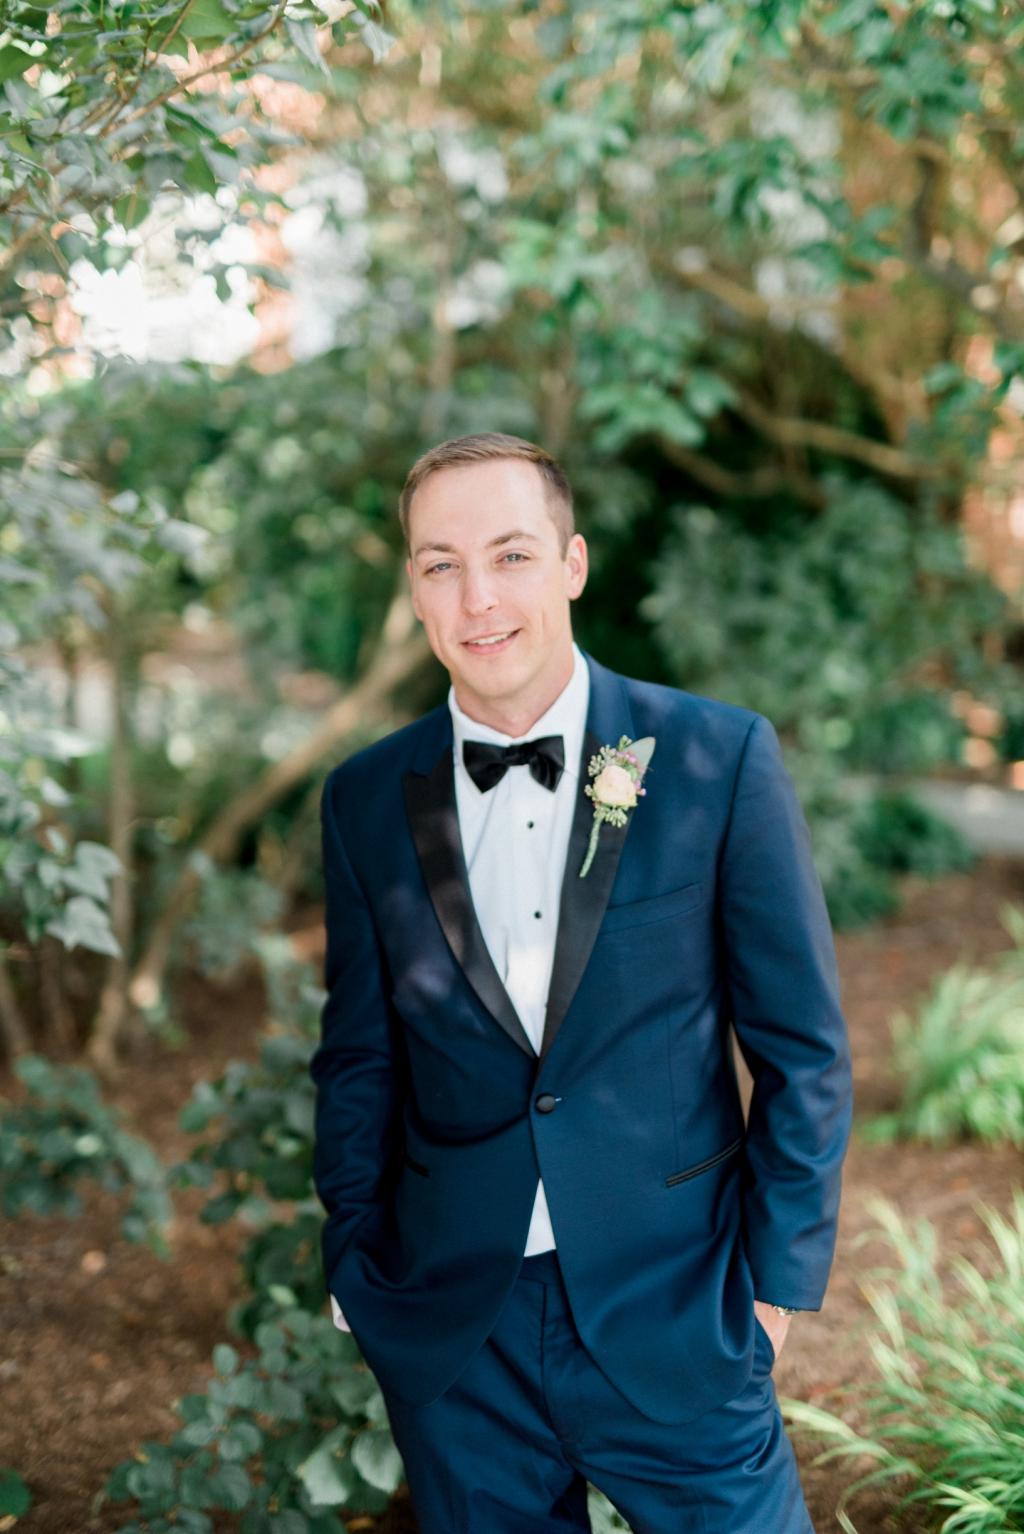 haley-richter-photography-buena-vista-confrence-center-wedding-summer-089